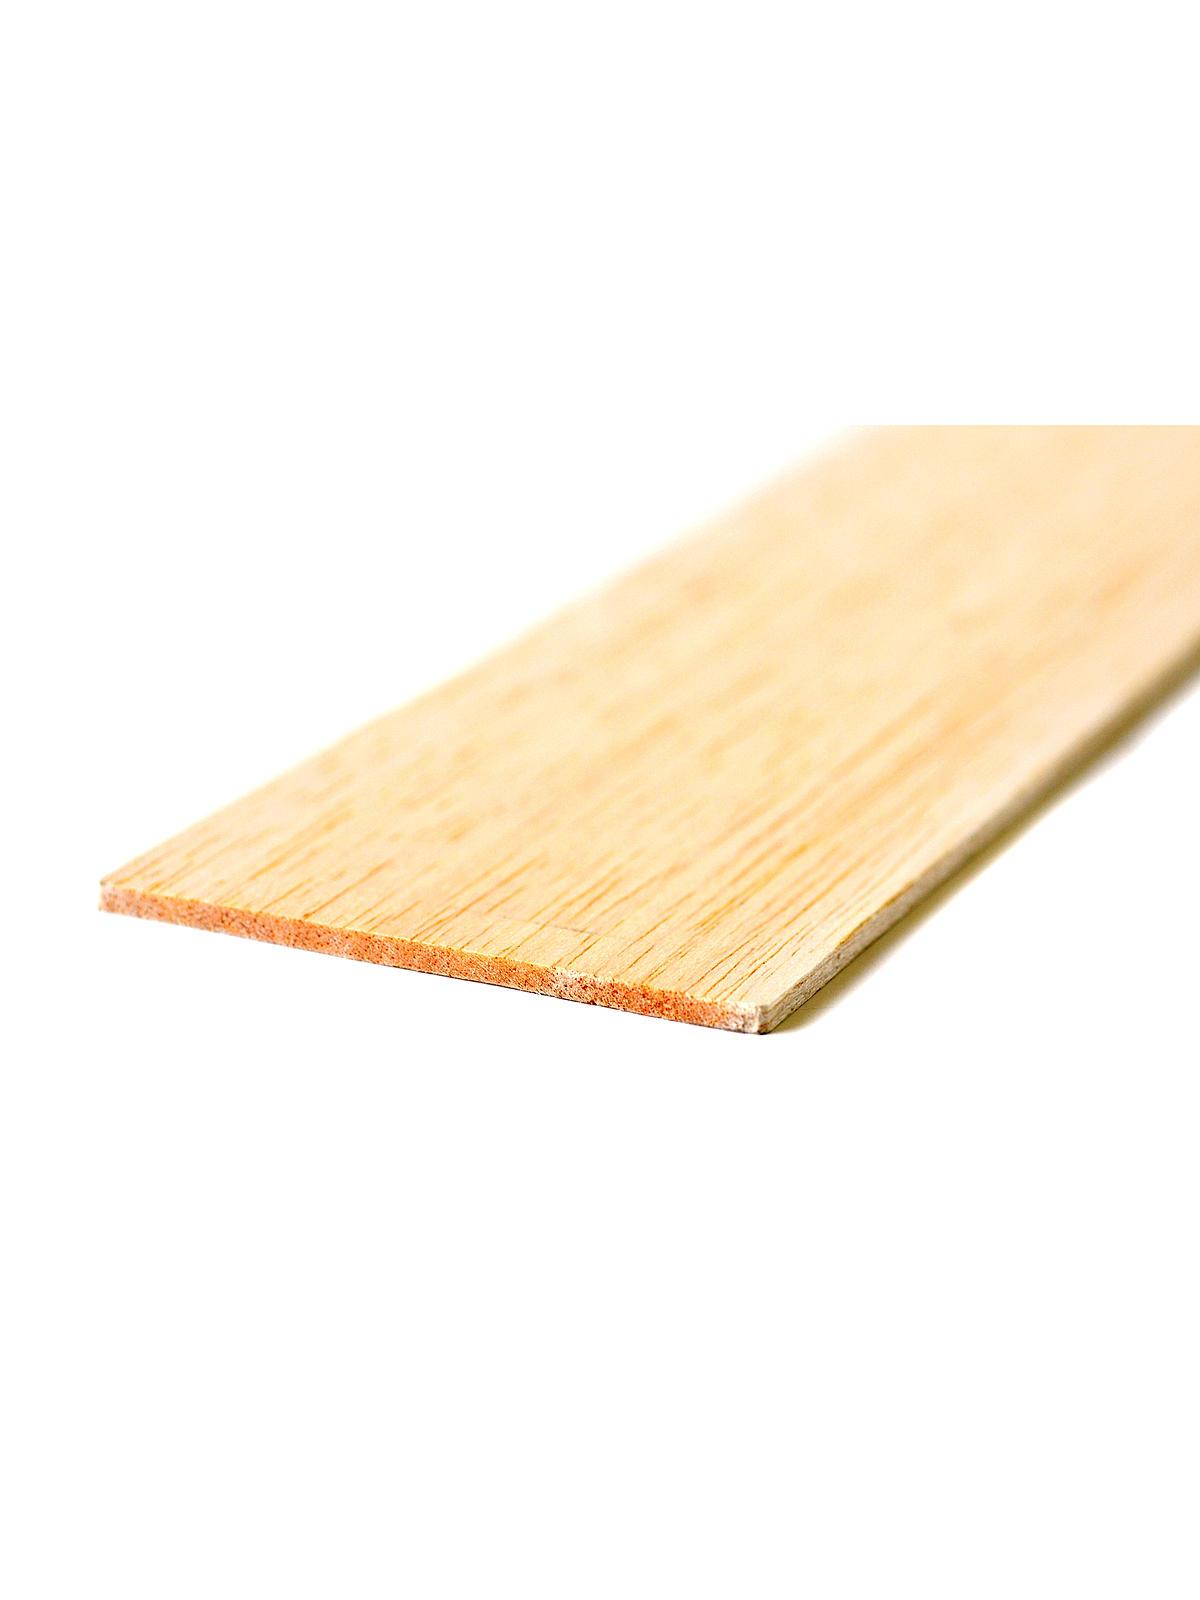 Balsa Wood Craft Supplies Crafting